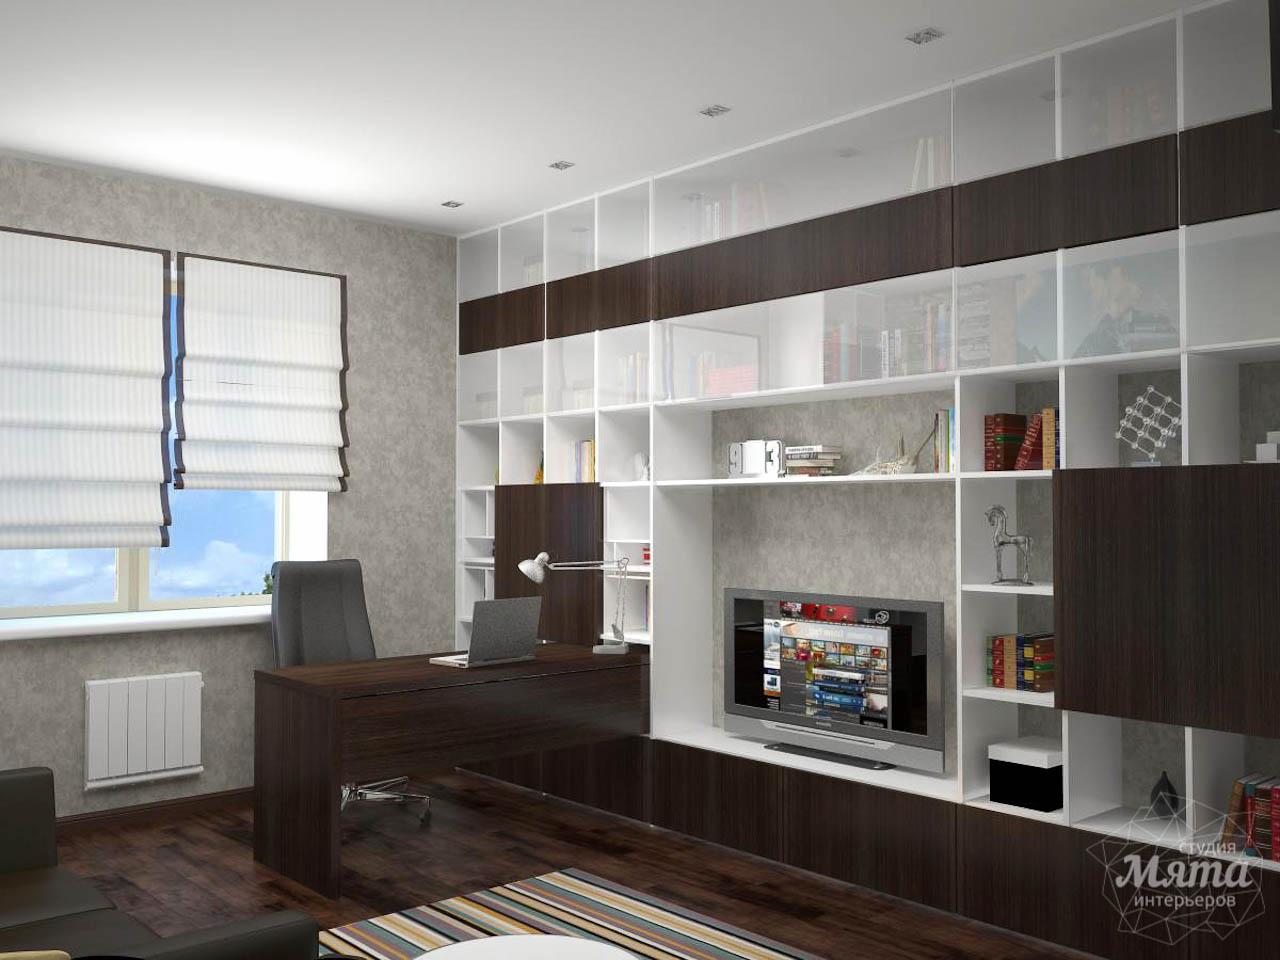 Дизайн проект интерьера коттеджа  в стиле минимализм по ул. Барвинка 15 img1168616942